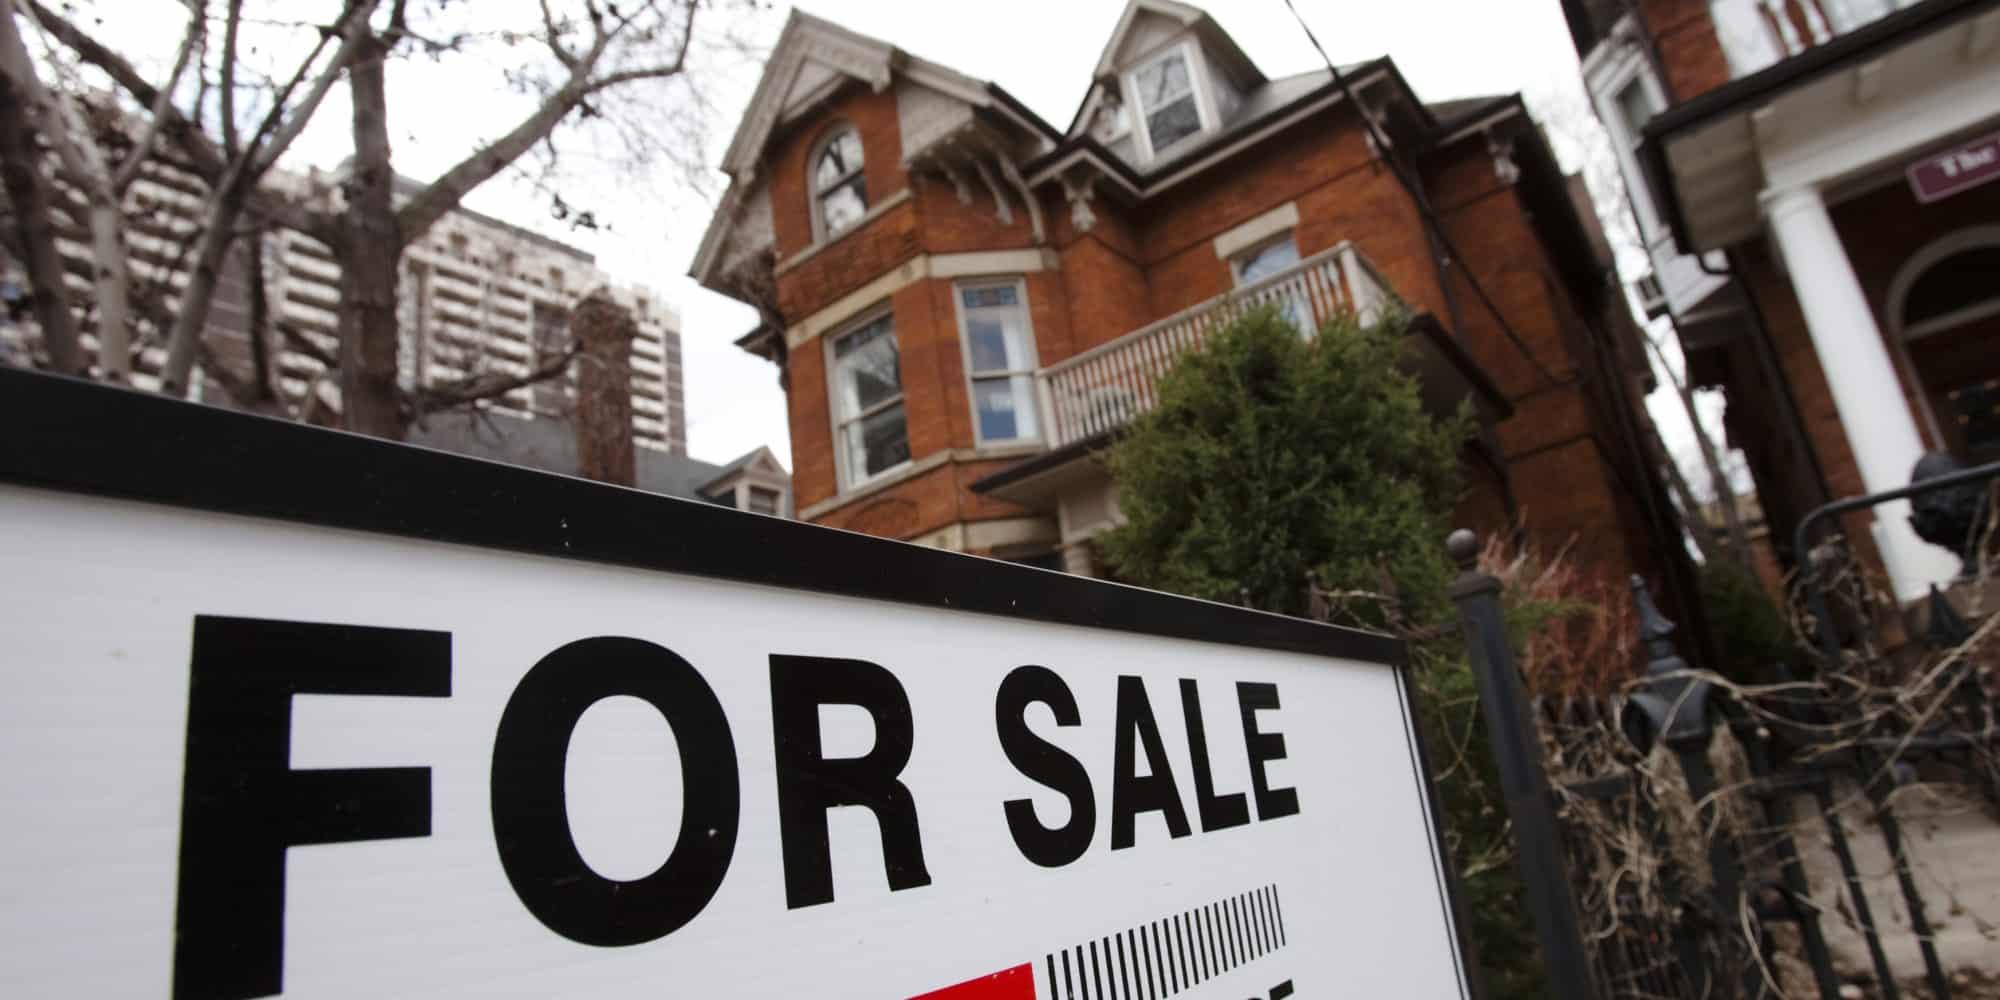 Promedio de precios de casas en Toronto suben un 23%